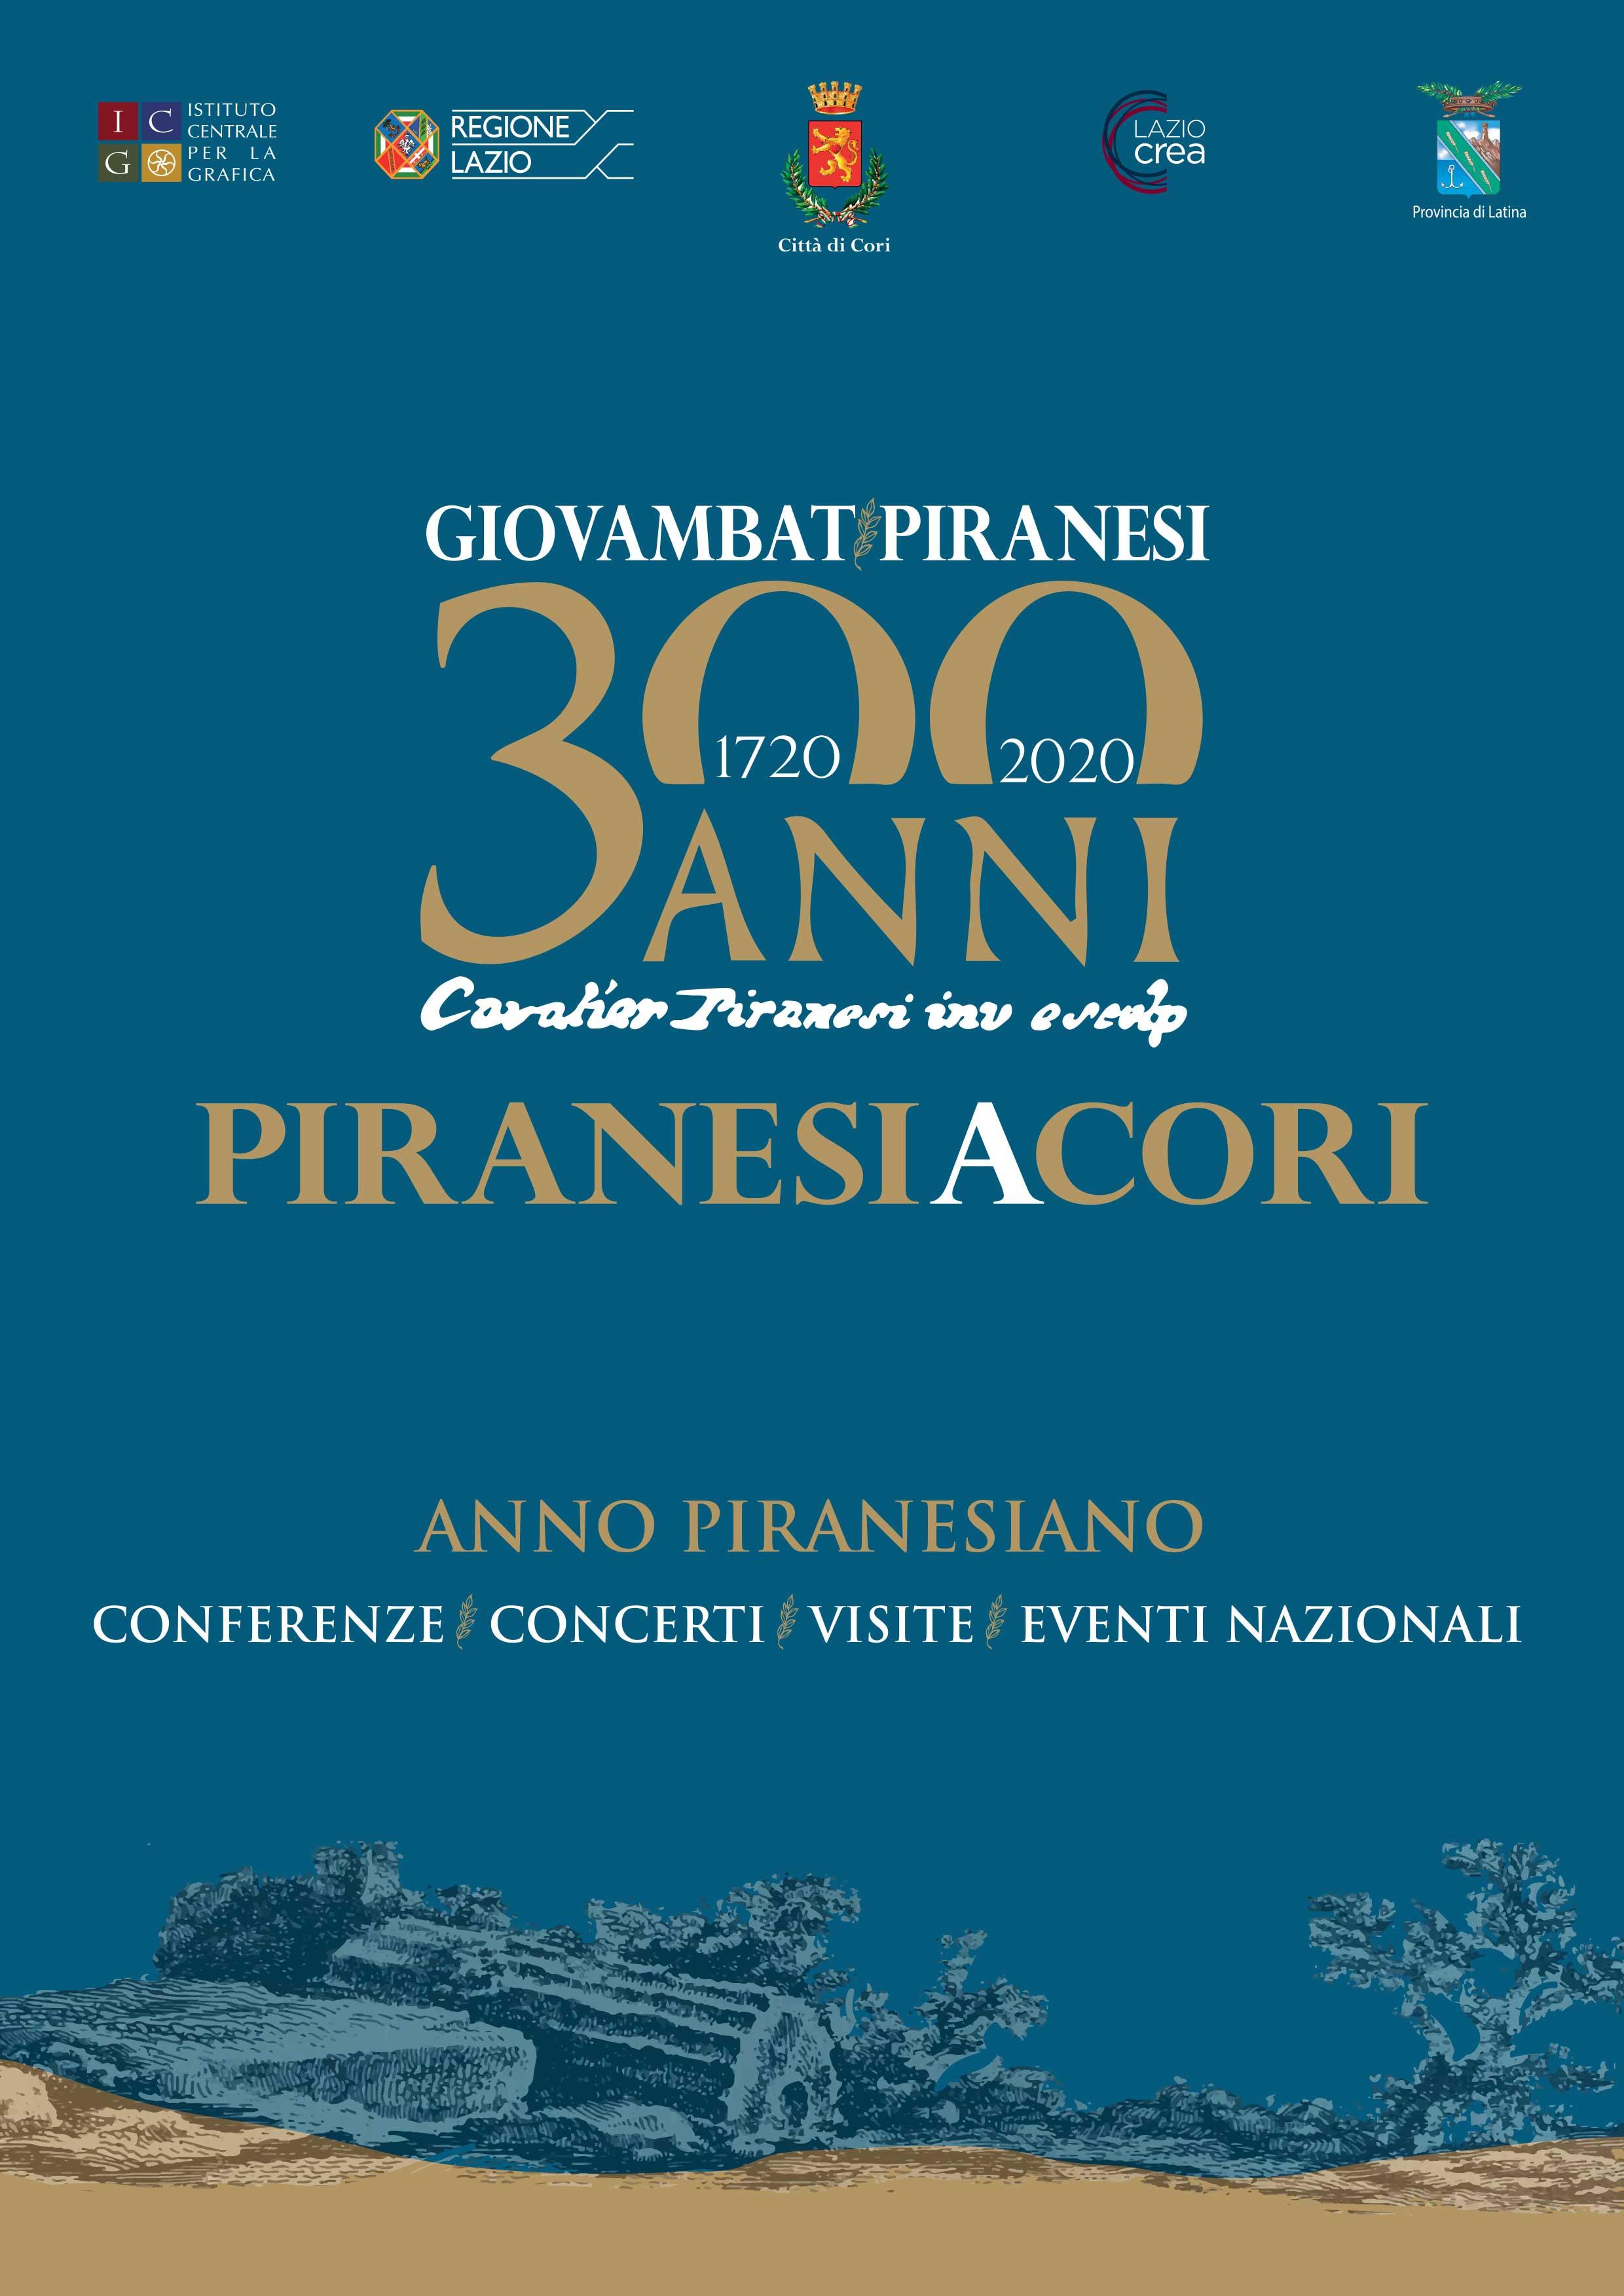 programm_piranesi-1